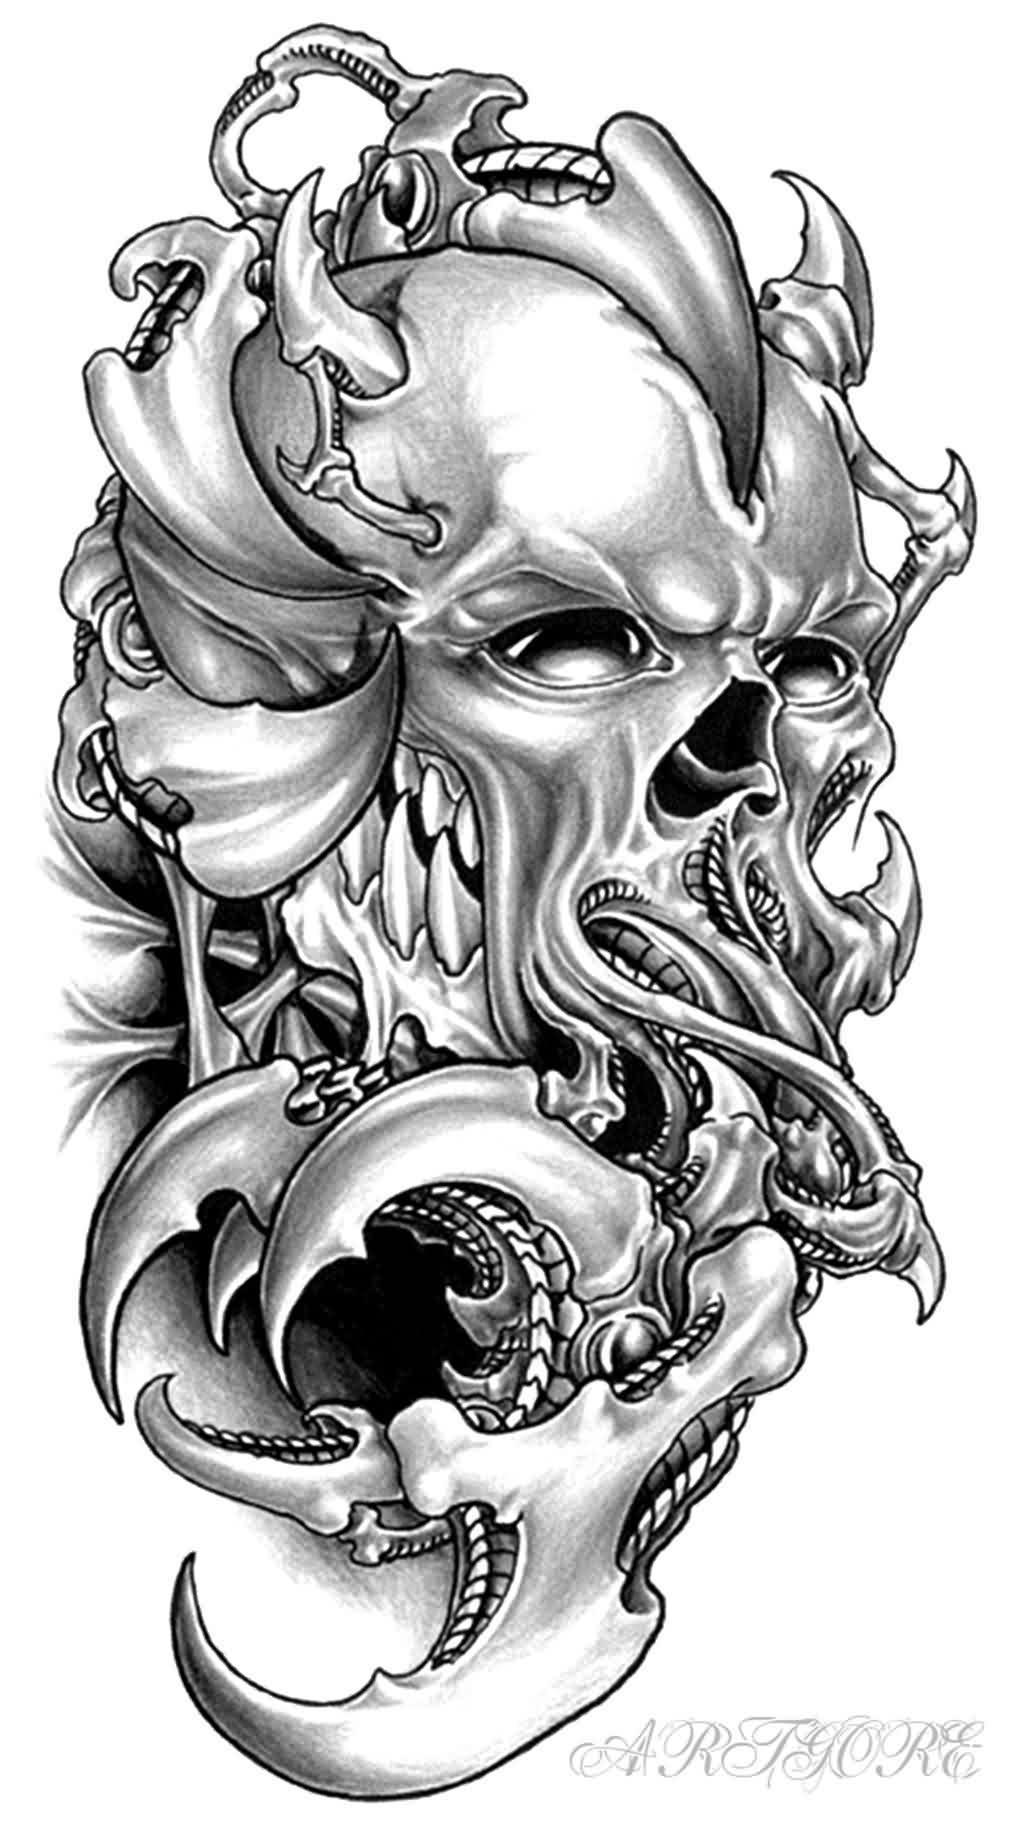 45 octopus skull tattoo designs and ideas. Black Bedroom Furniture Sets. Home Design Ideas